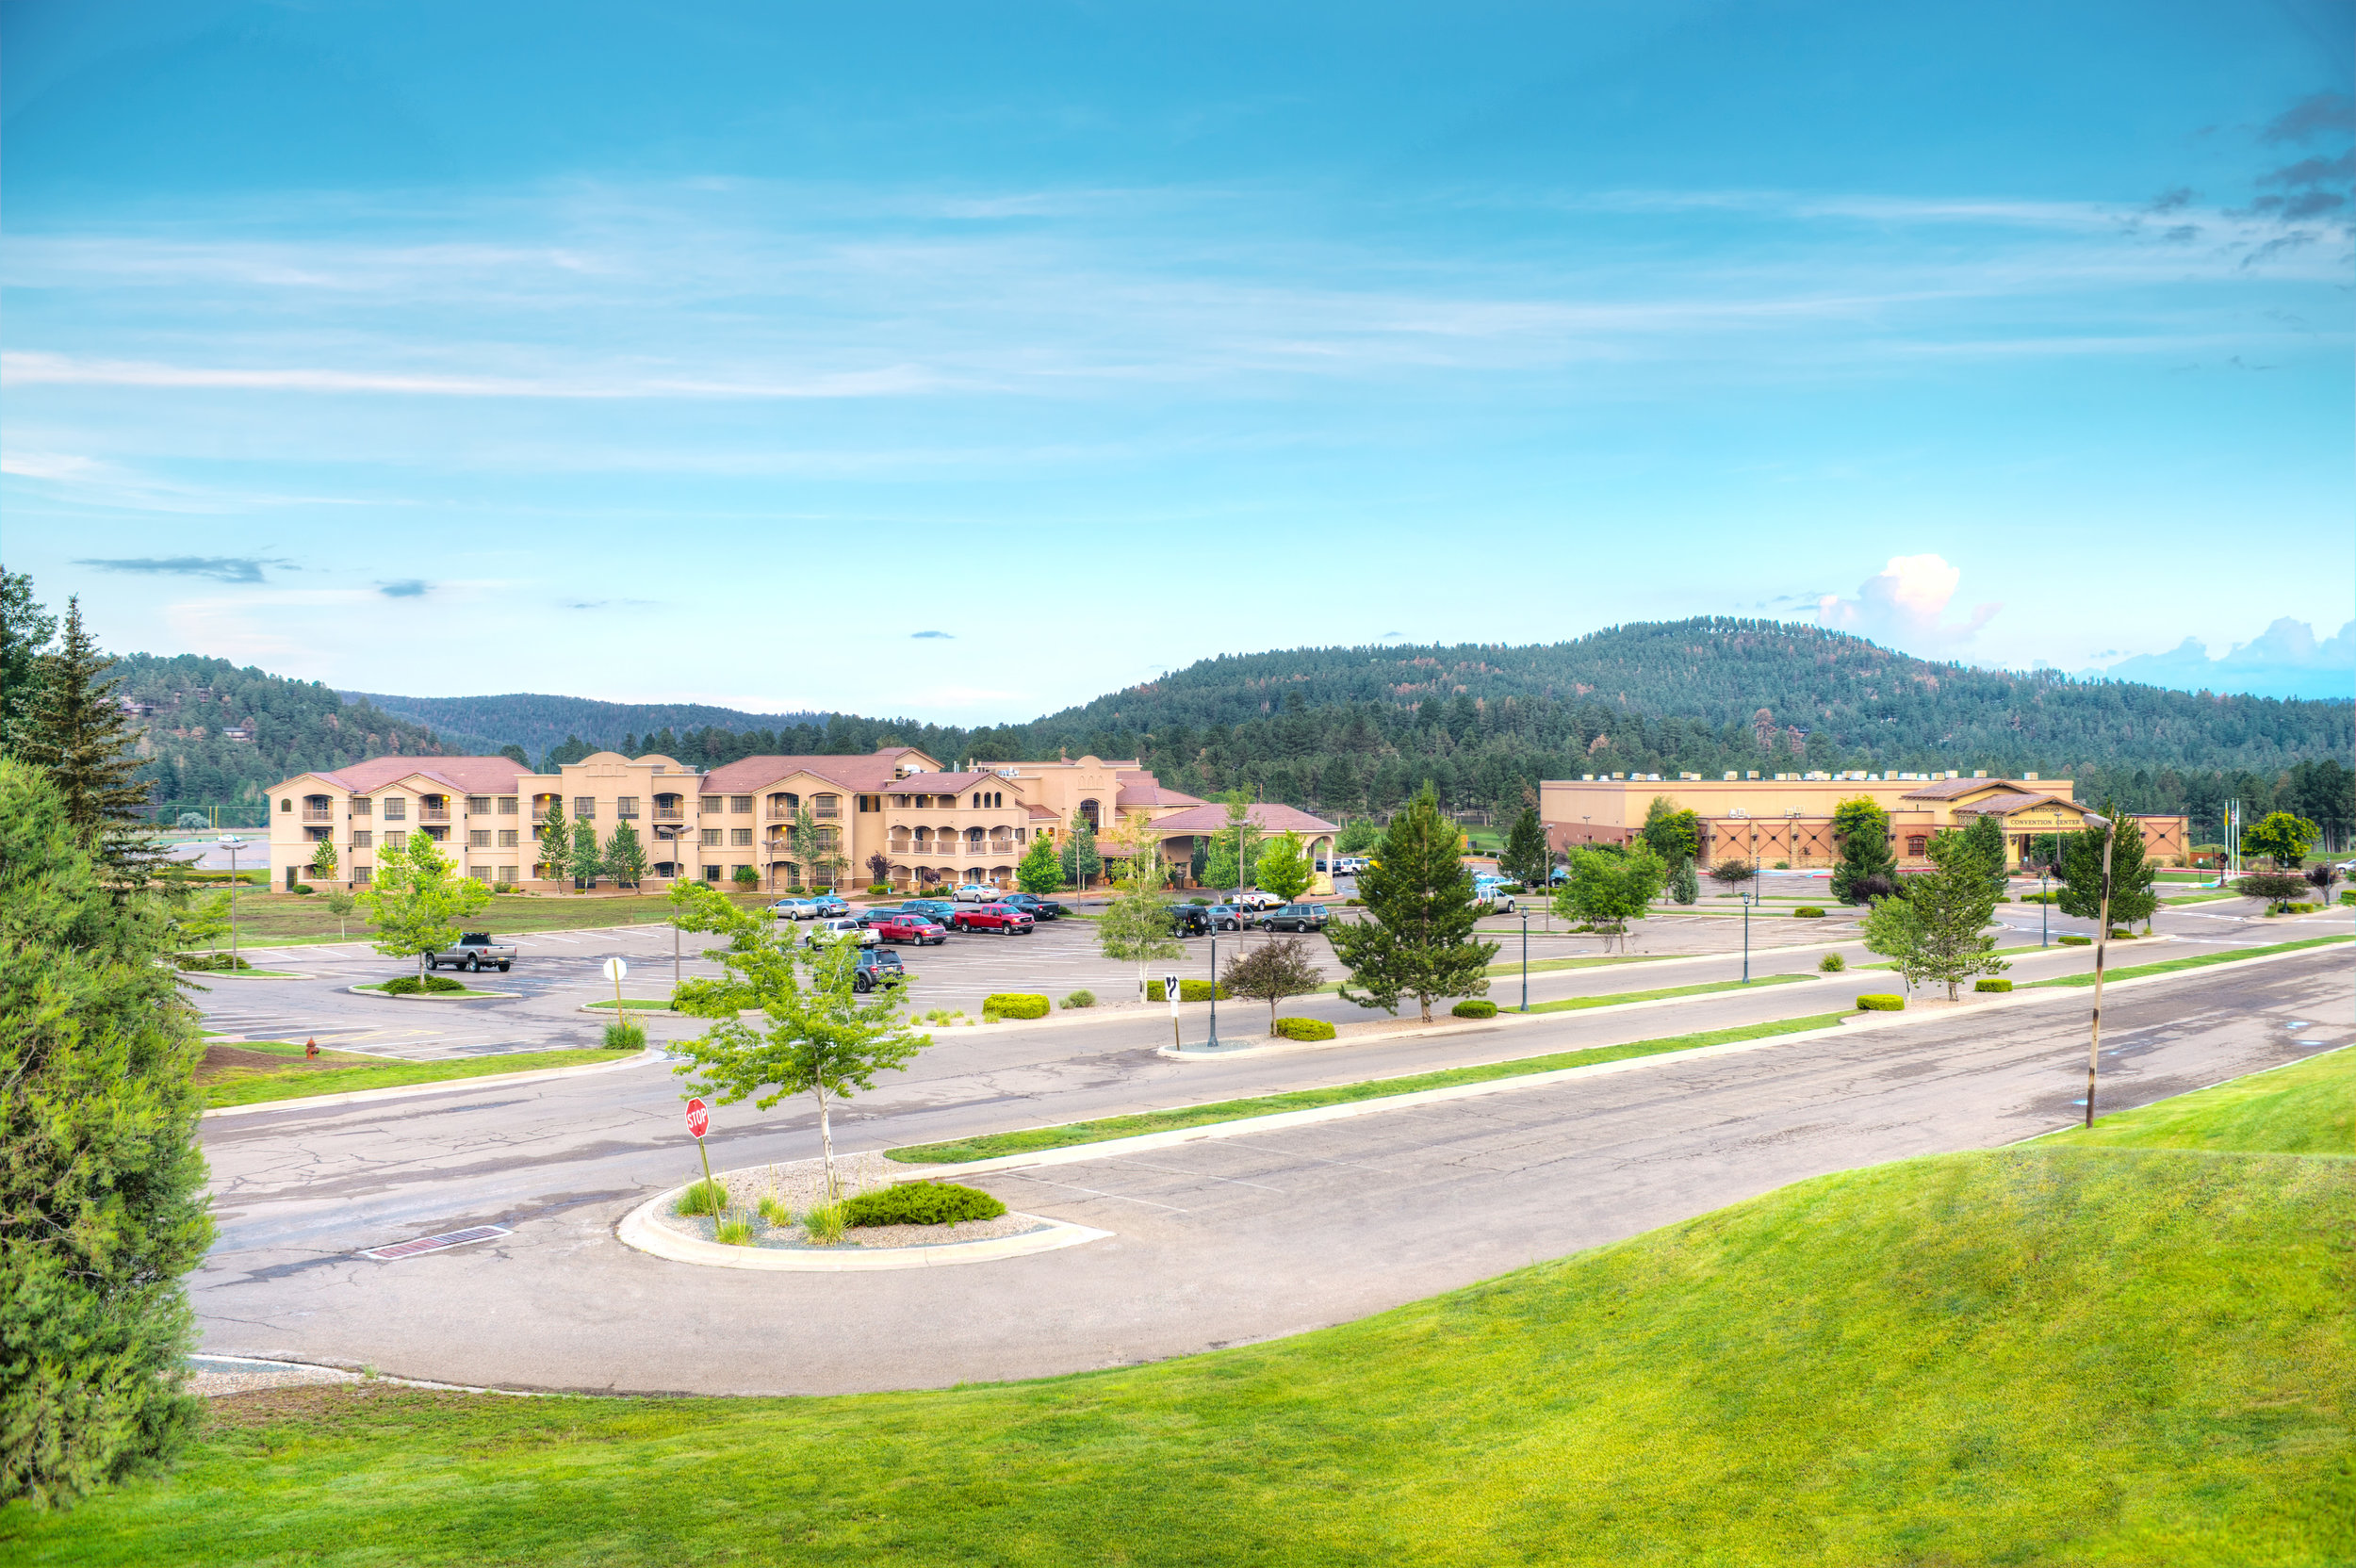 Ruidoso Convention Center & MCM Elegante Lodge & Resort